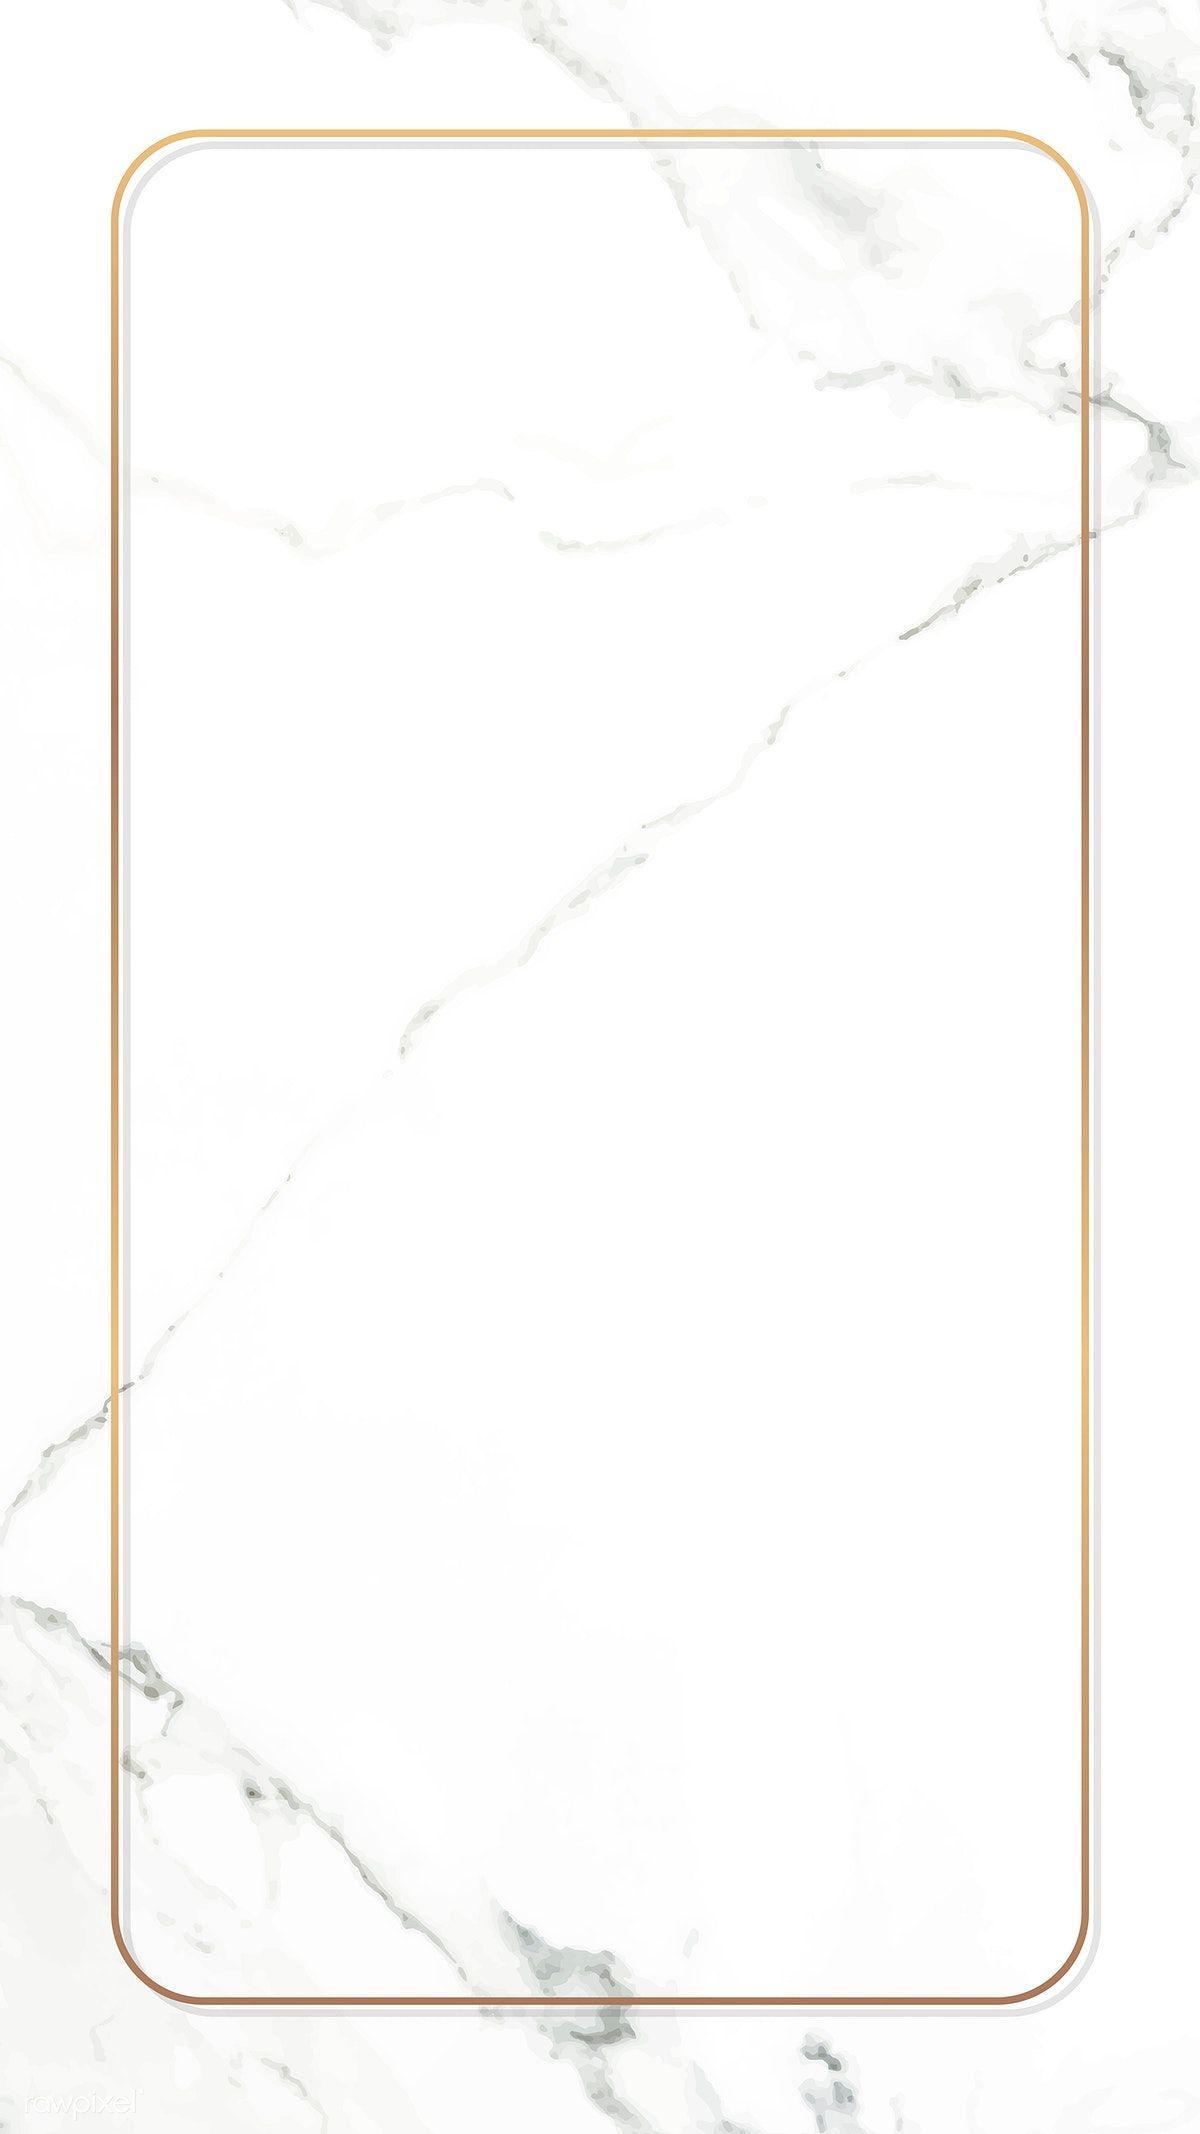 Descargar Prima De Vector De Marco De Oro Del Rectangulo De Marmol Blanco Fondo De Pantalla Del Telefono Movi In 2020 Gold Frame Gold Wallpaper Background White Marble